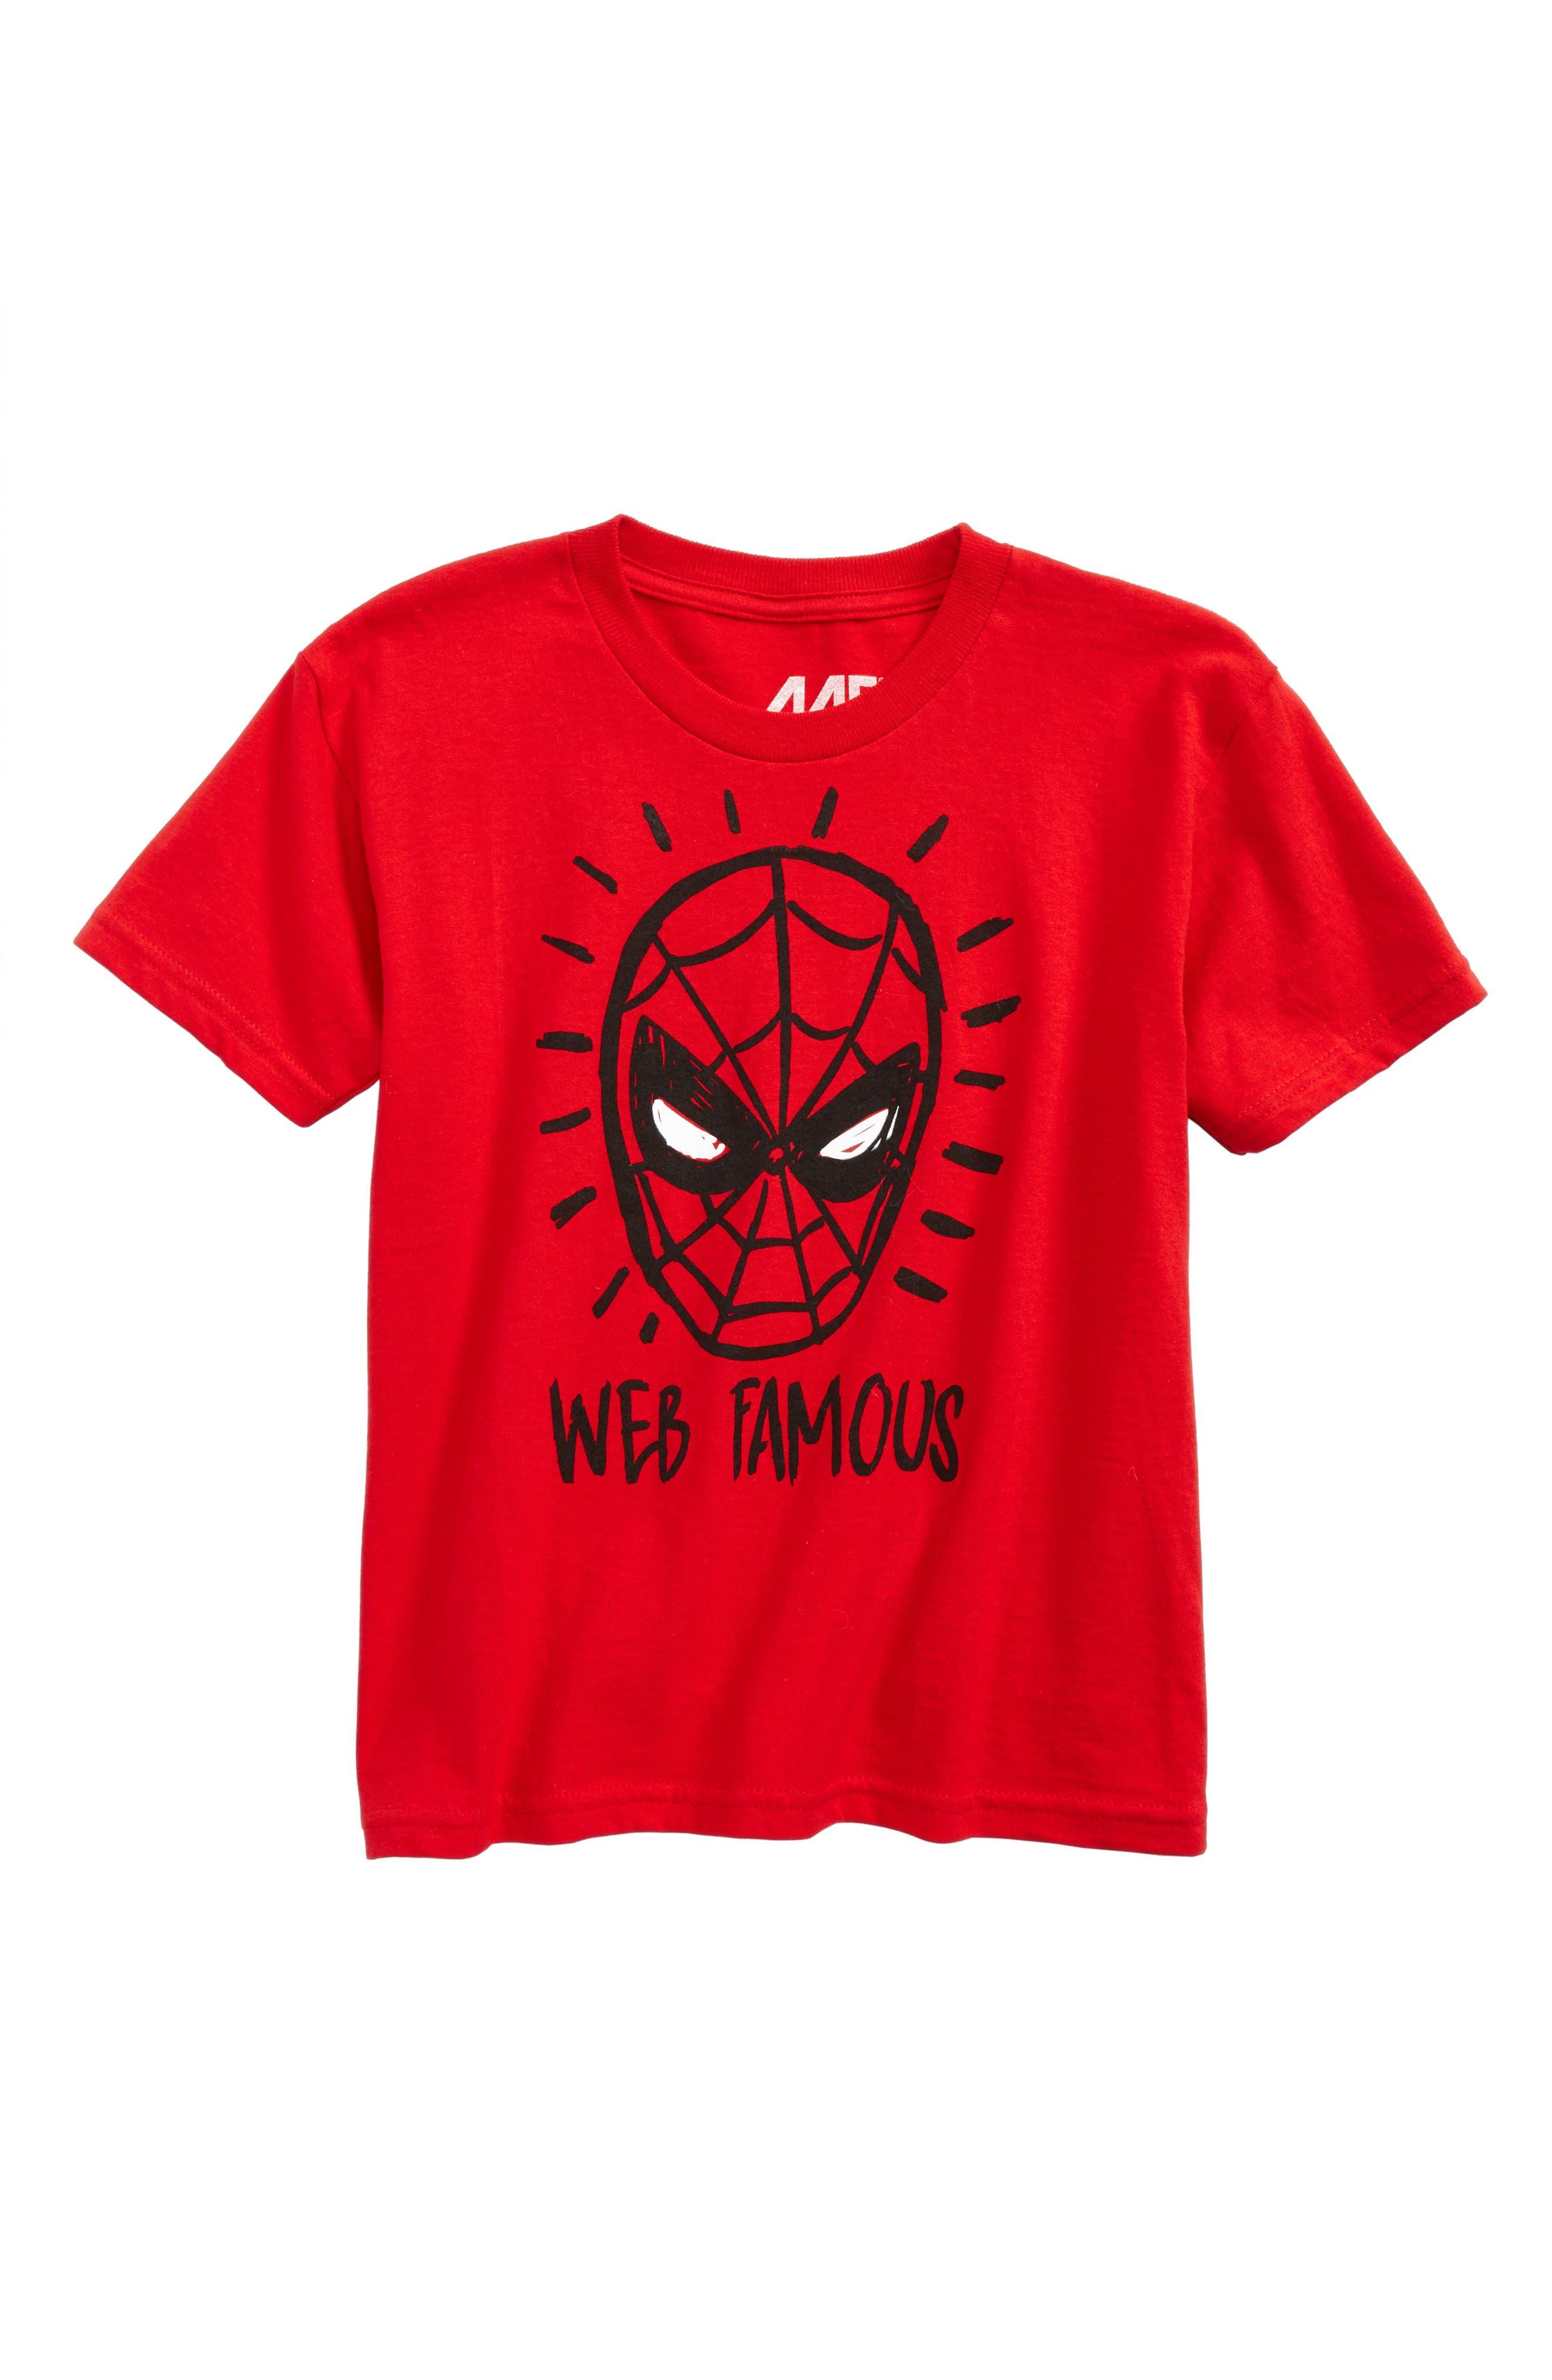 Main Image - Mighty Fine Spider-Man - Web Famous T-Shirt (Toddler Boys, Little Boys & Big Boys)